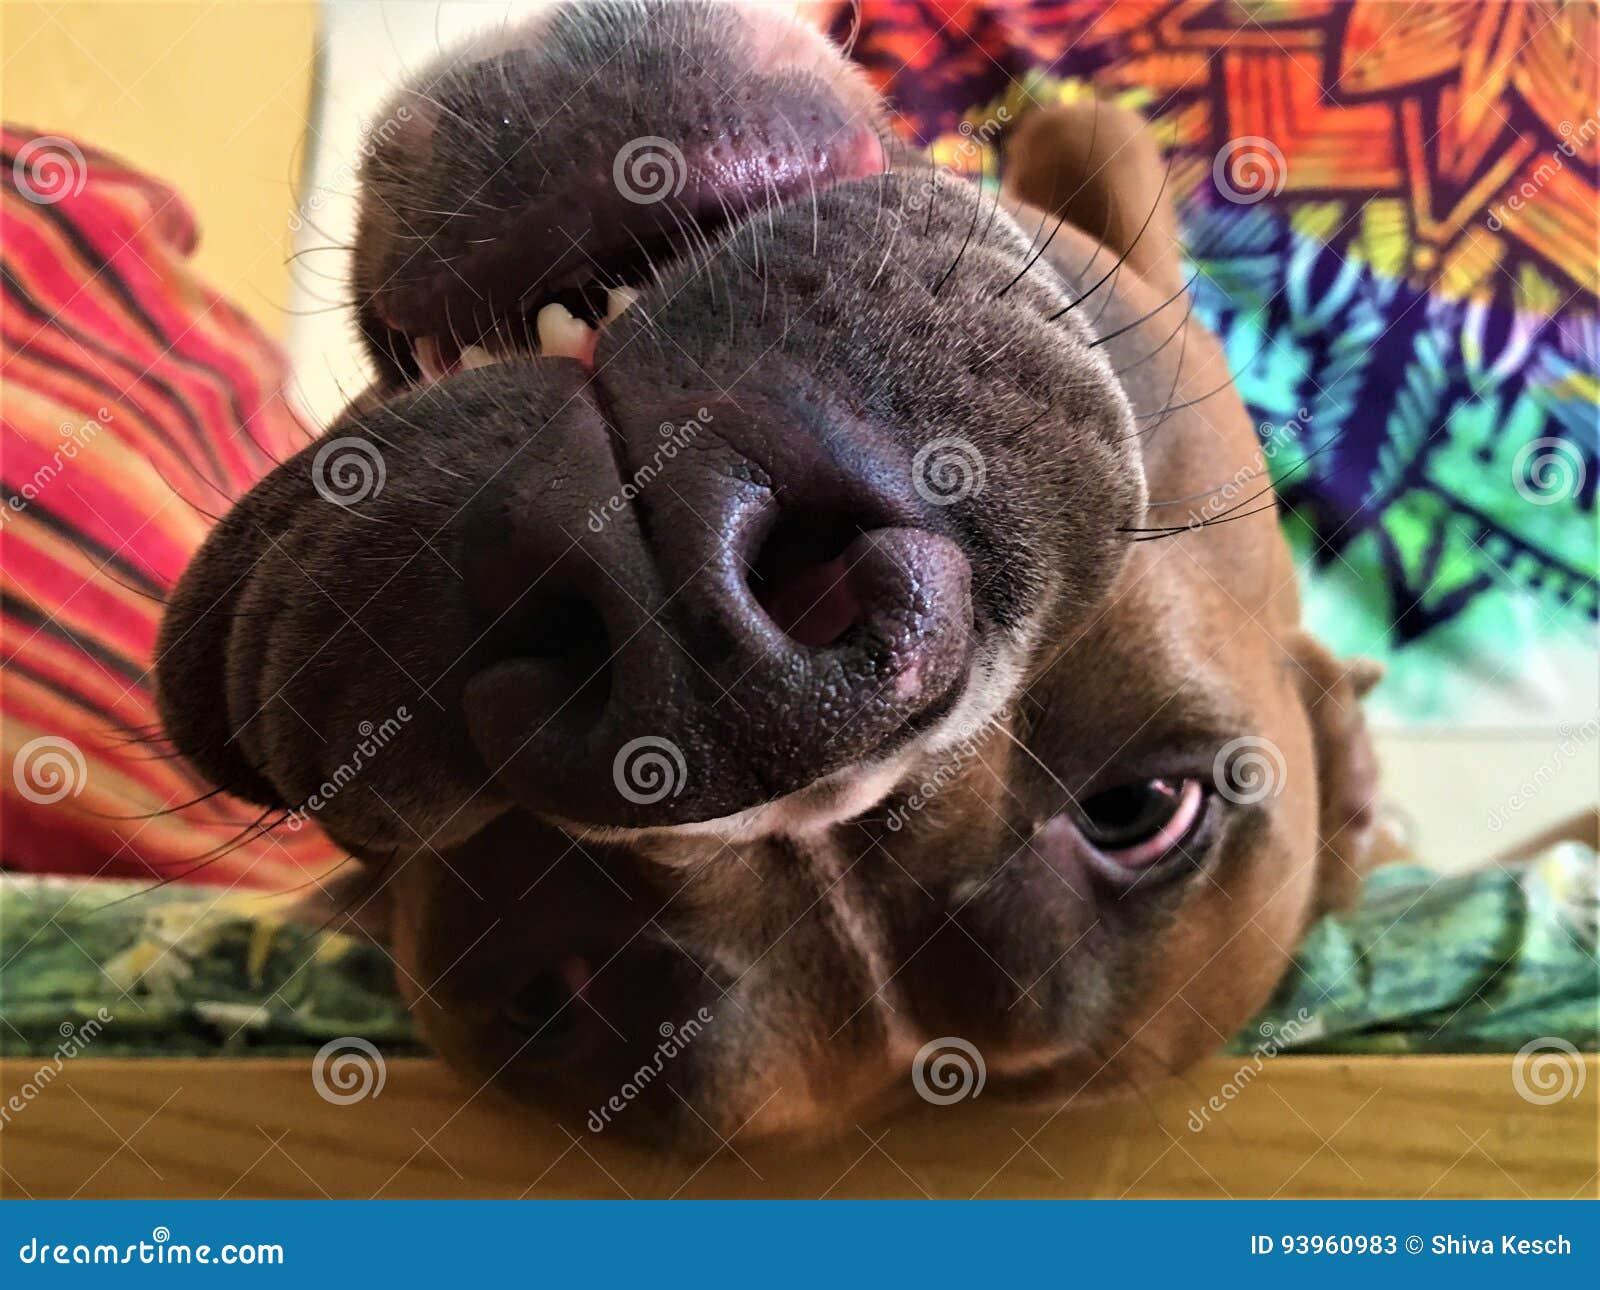 Game over! stock image  Image of pitbull, animal, muzzle